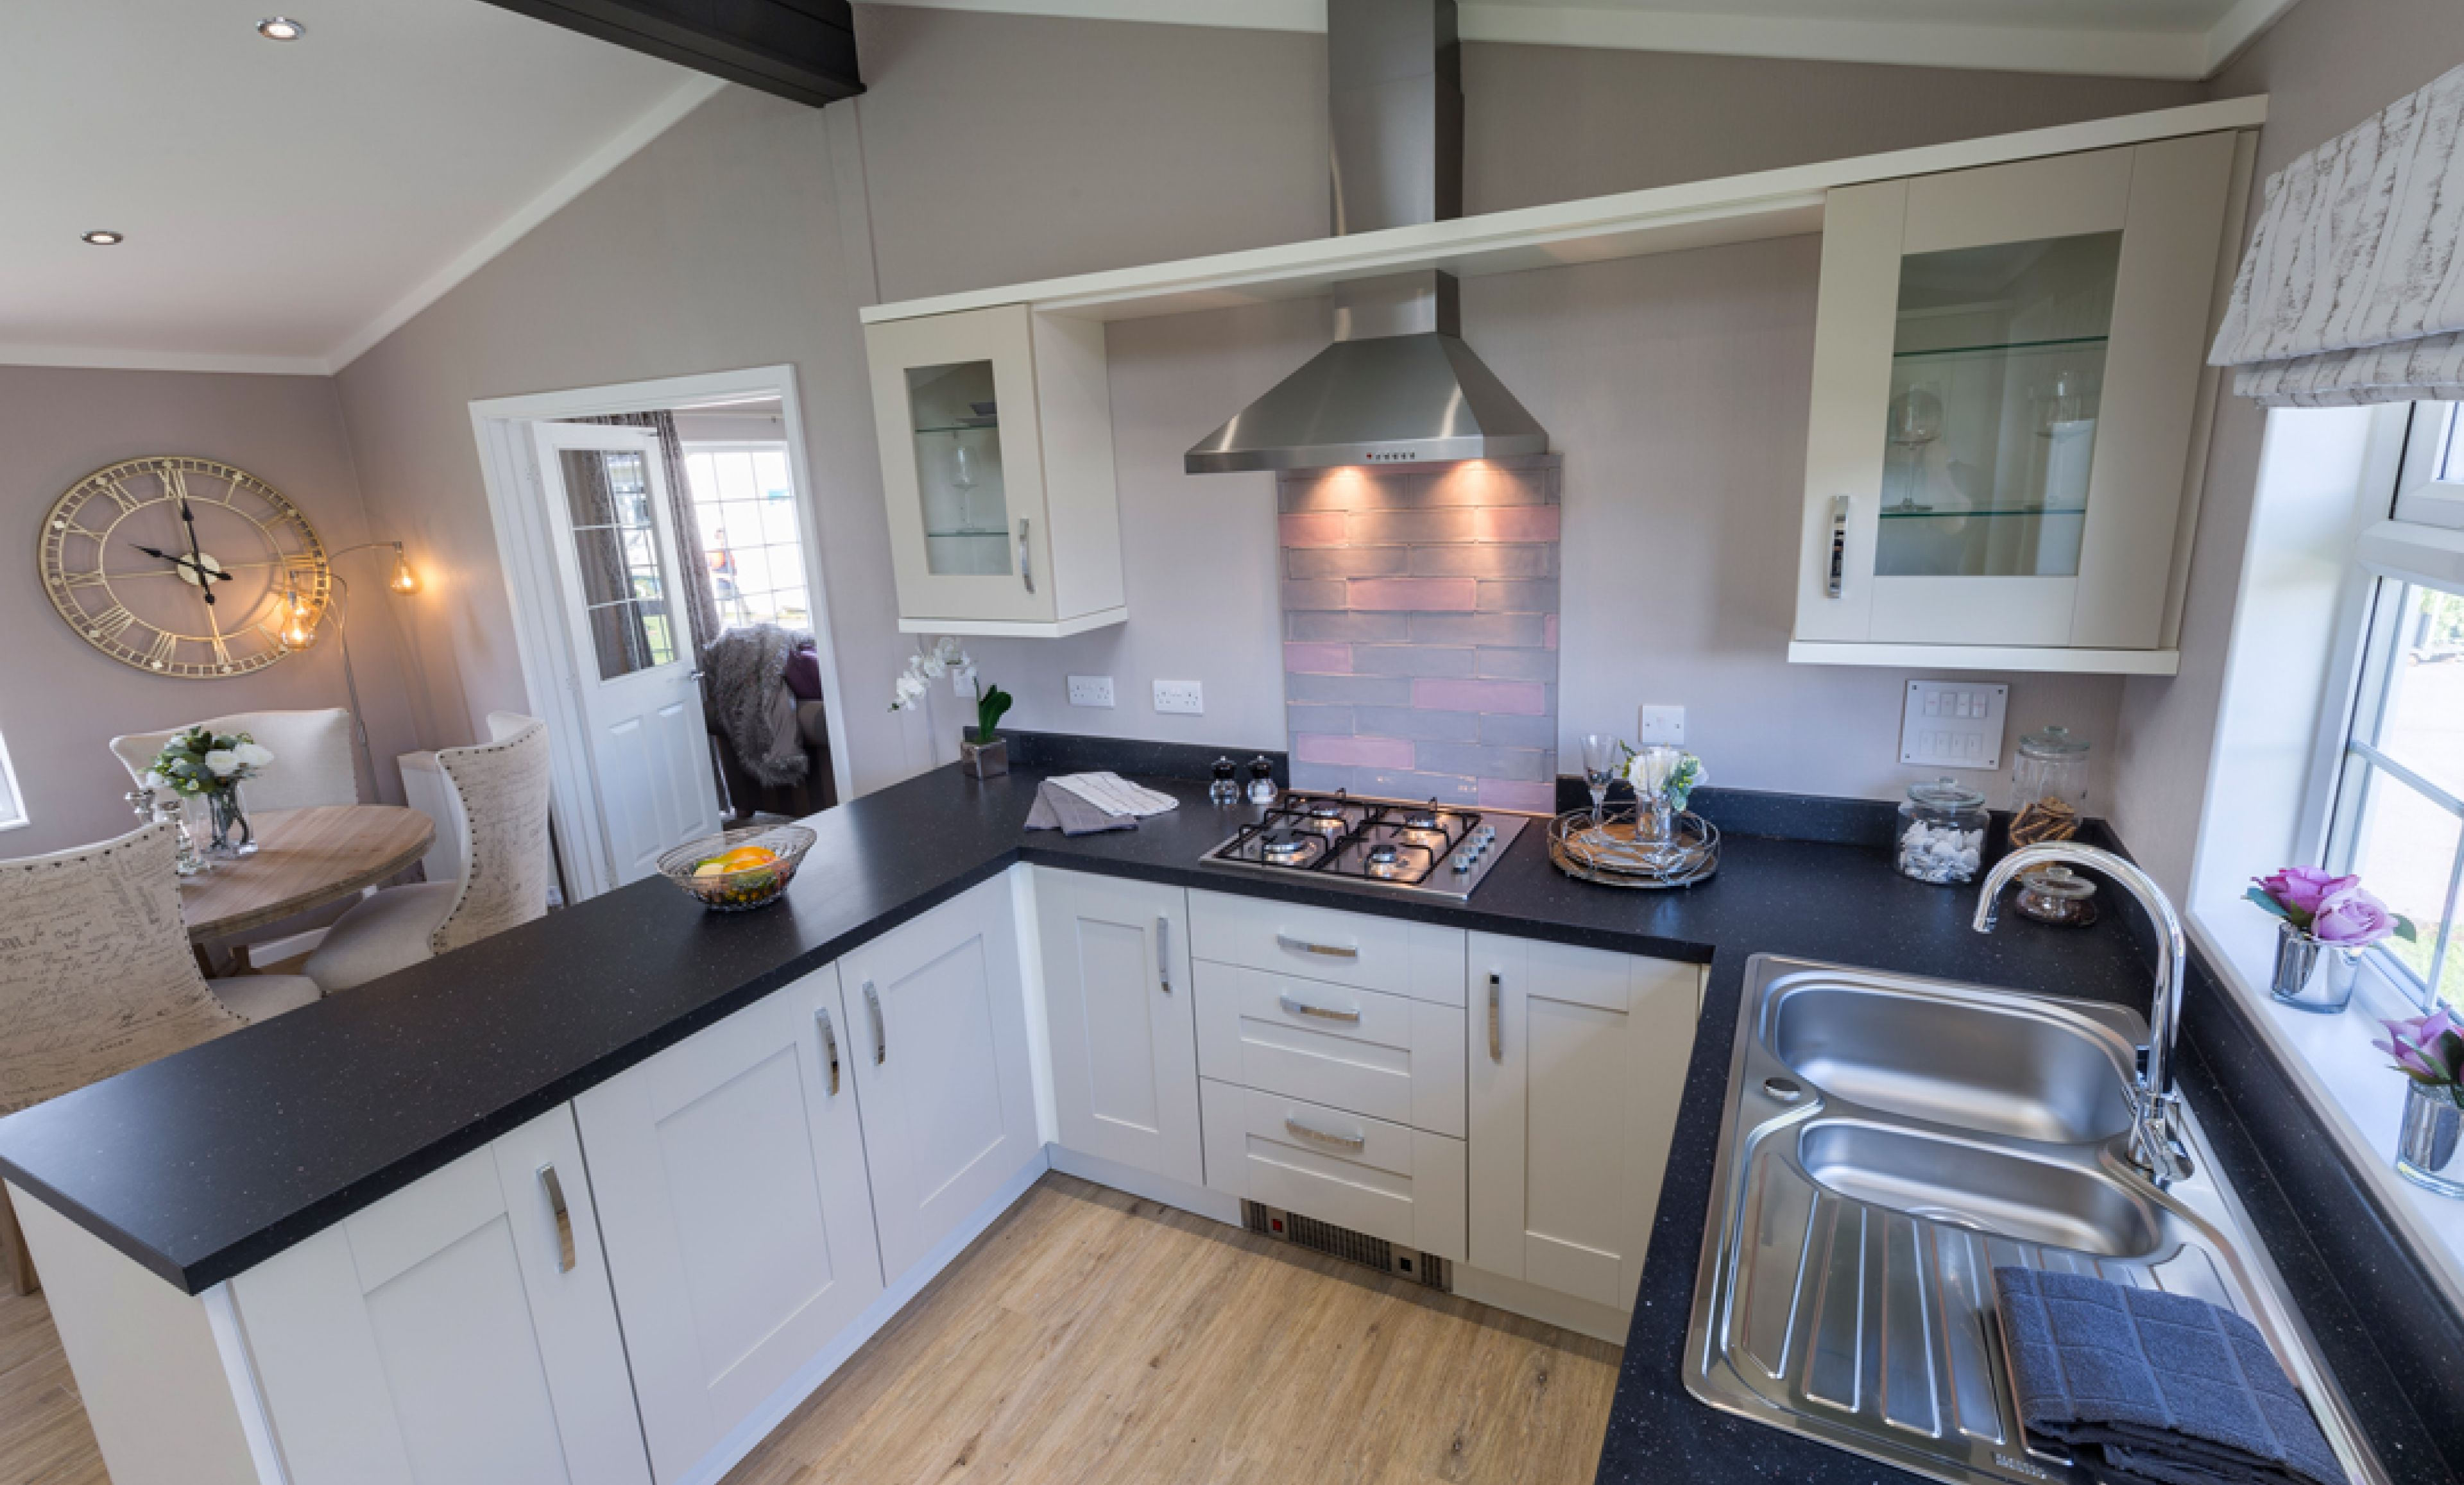 The Regency Classic kitchen